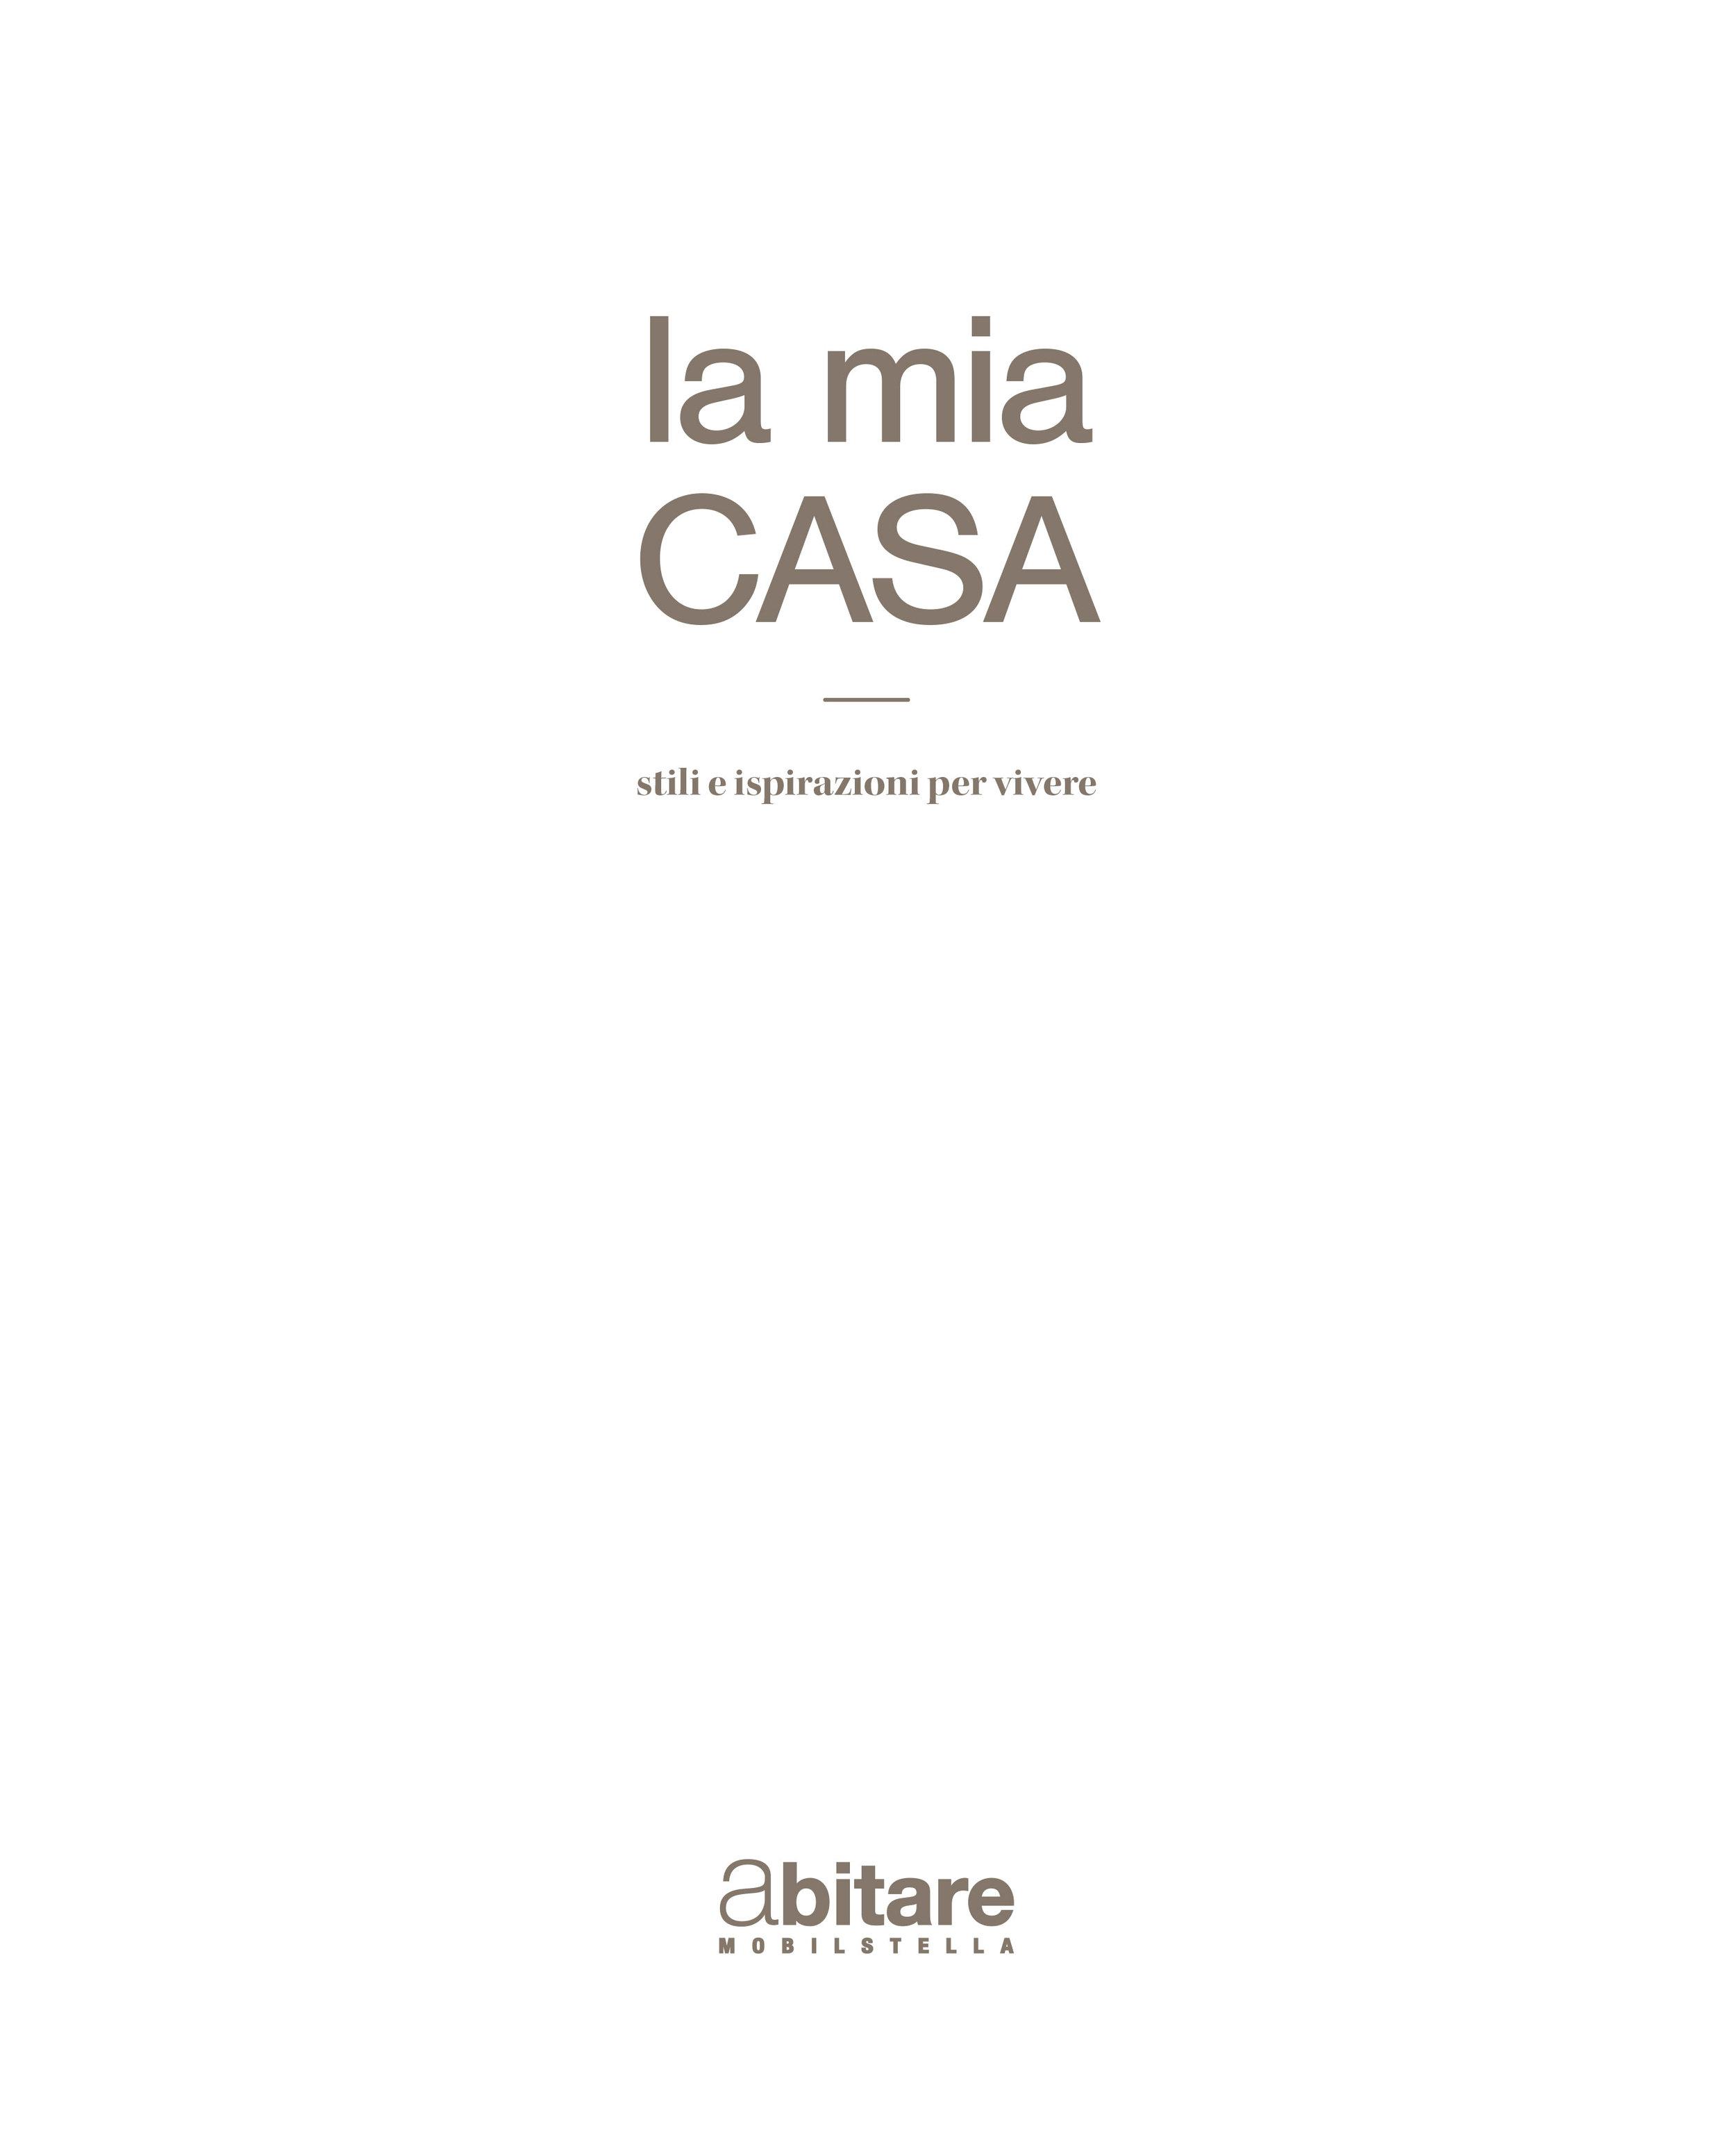 195904_Mobilstella_Cat_Casa_AFF_HR.jpg